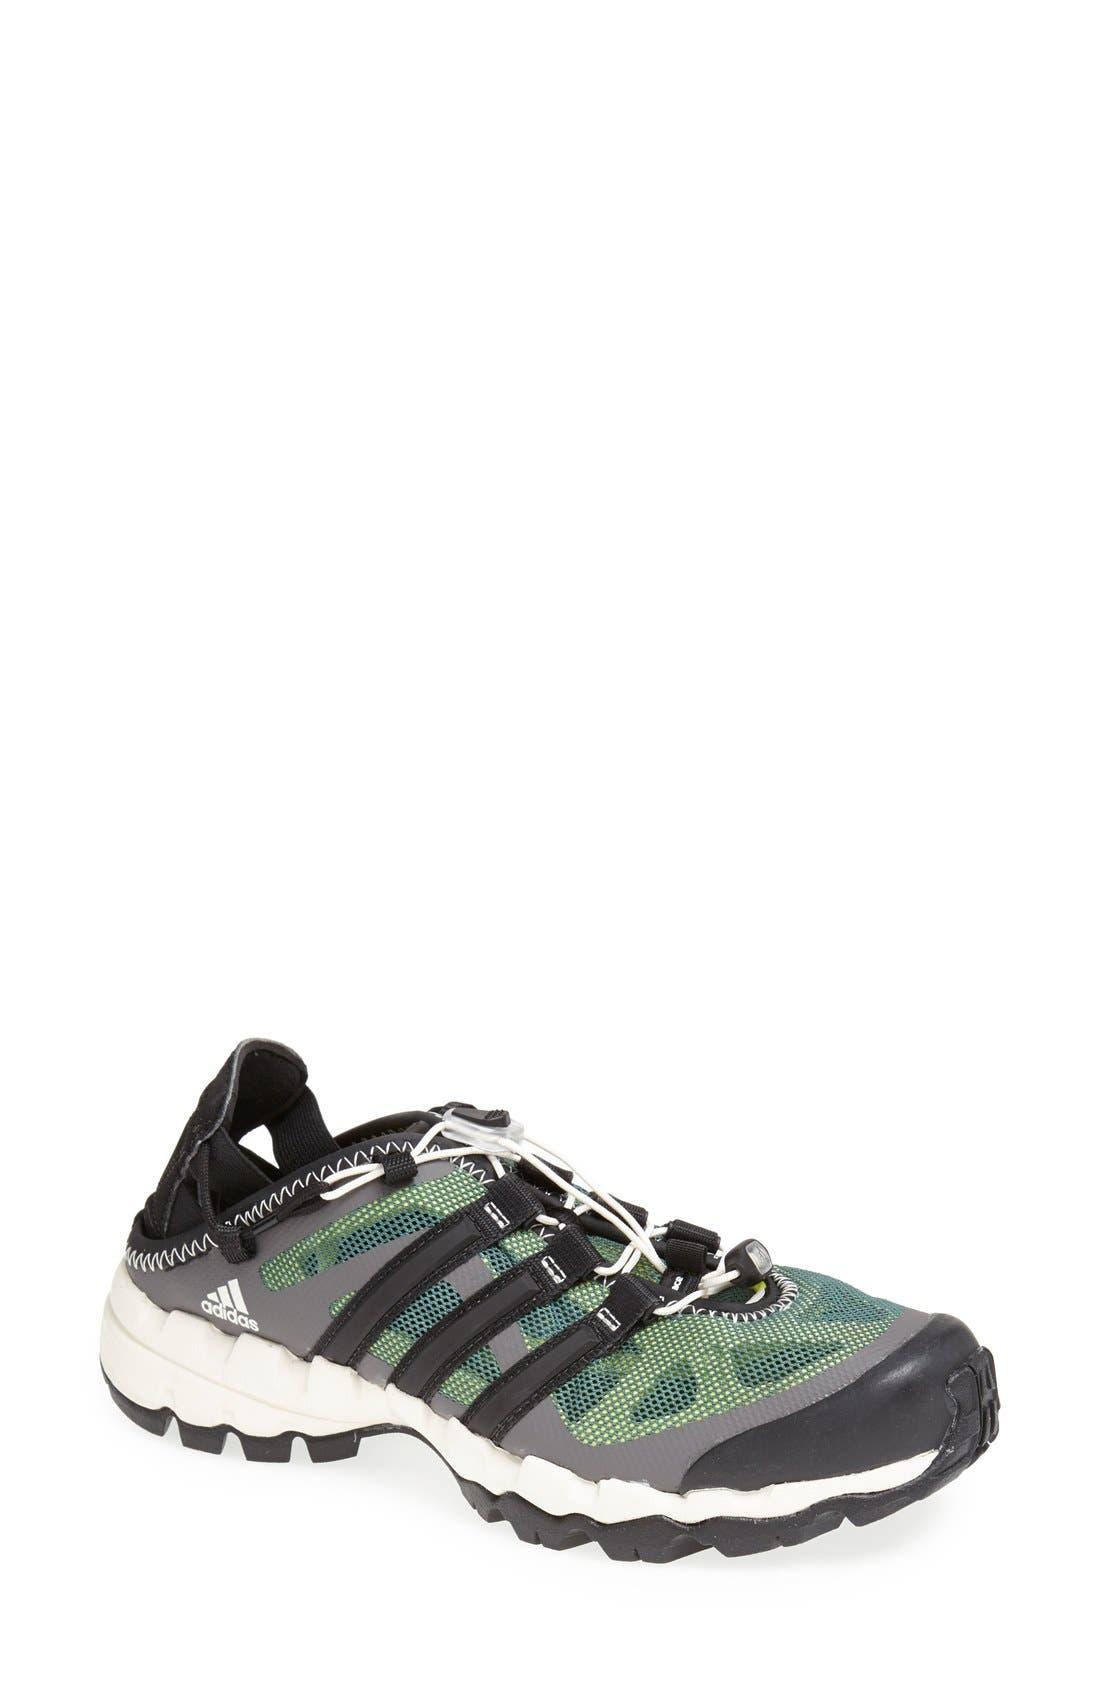 Alternate Image 1 Selected - adidas 'Hydroterra' Walking Shoe (Women)